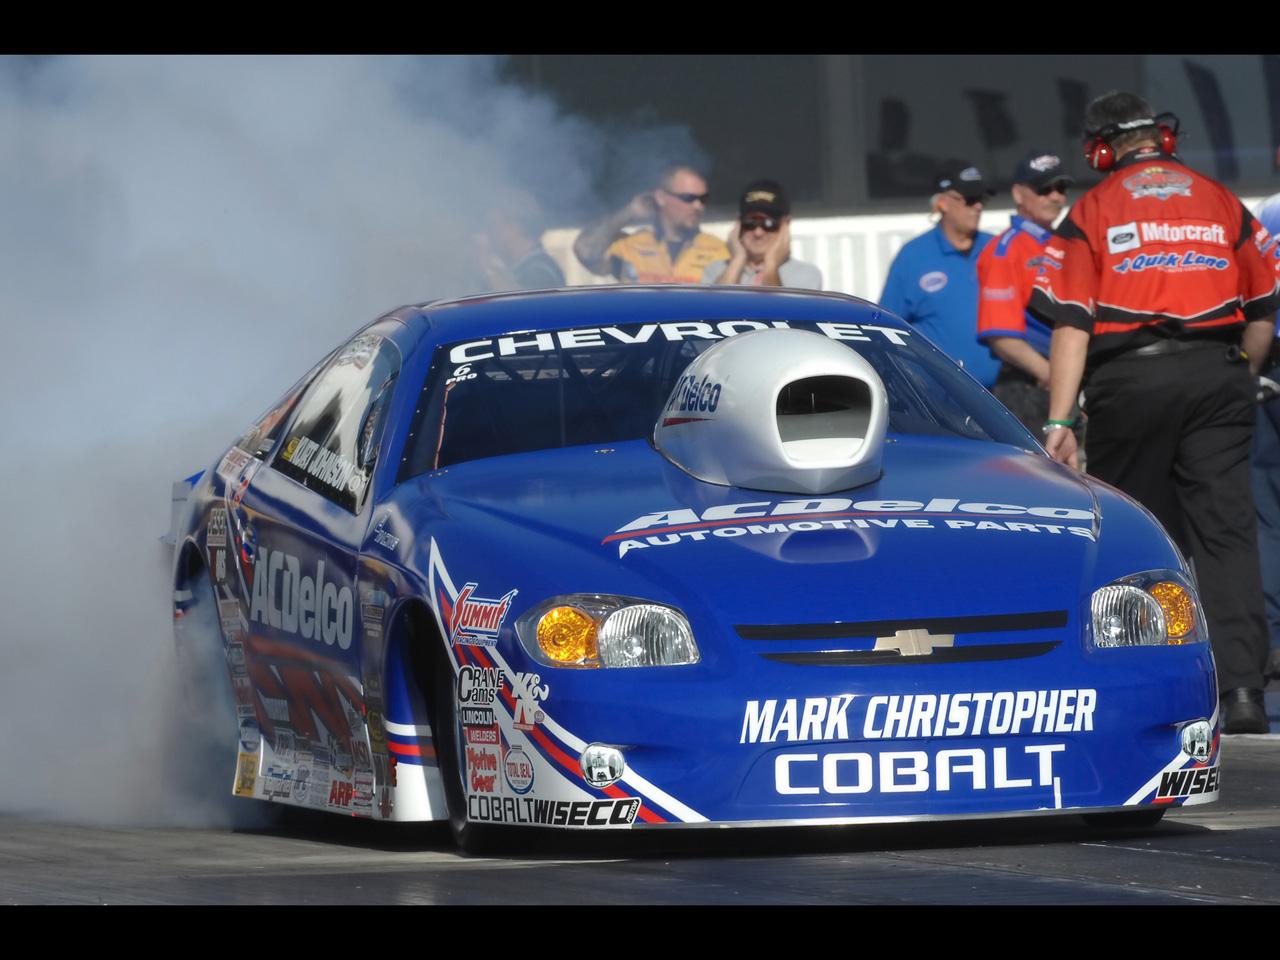 Chevrolet Cobalt NHRA Pro Stock   Kurt Johnson   1280x960   Wallpaper 1280x960